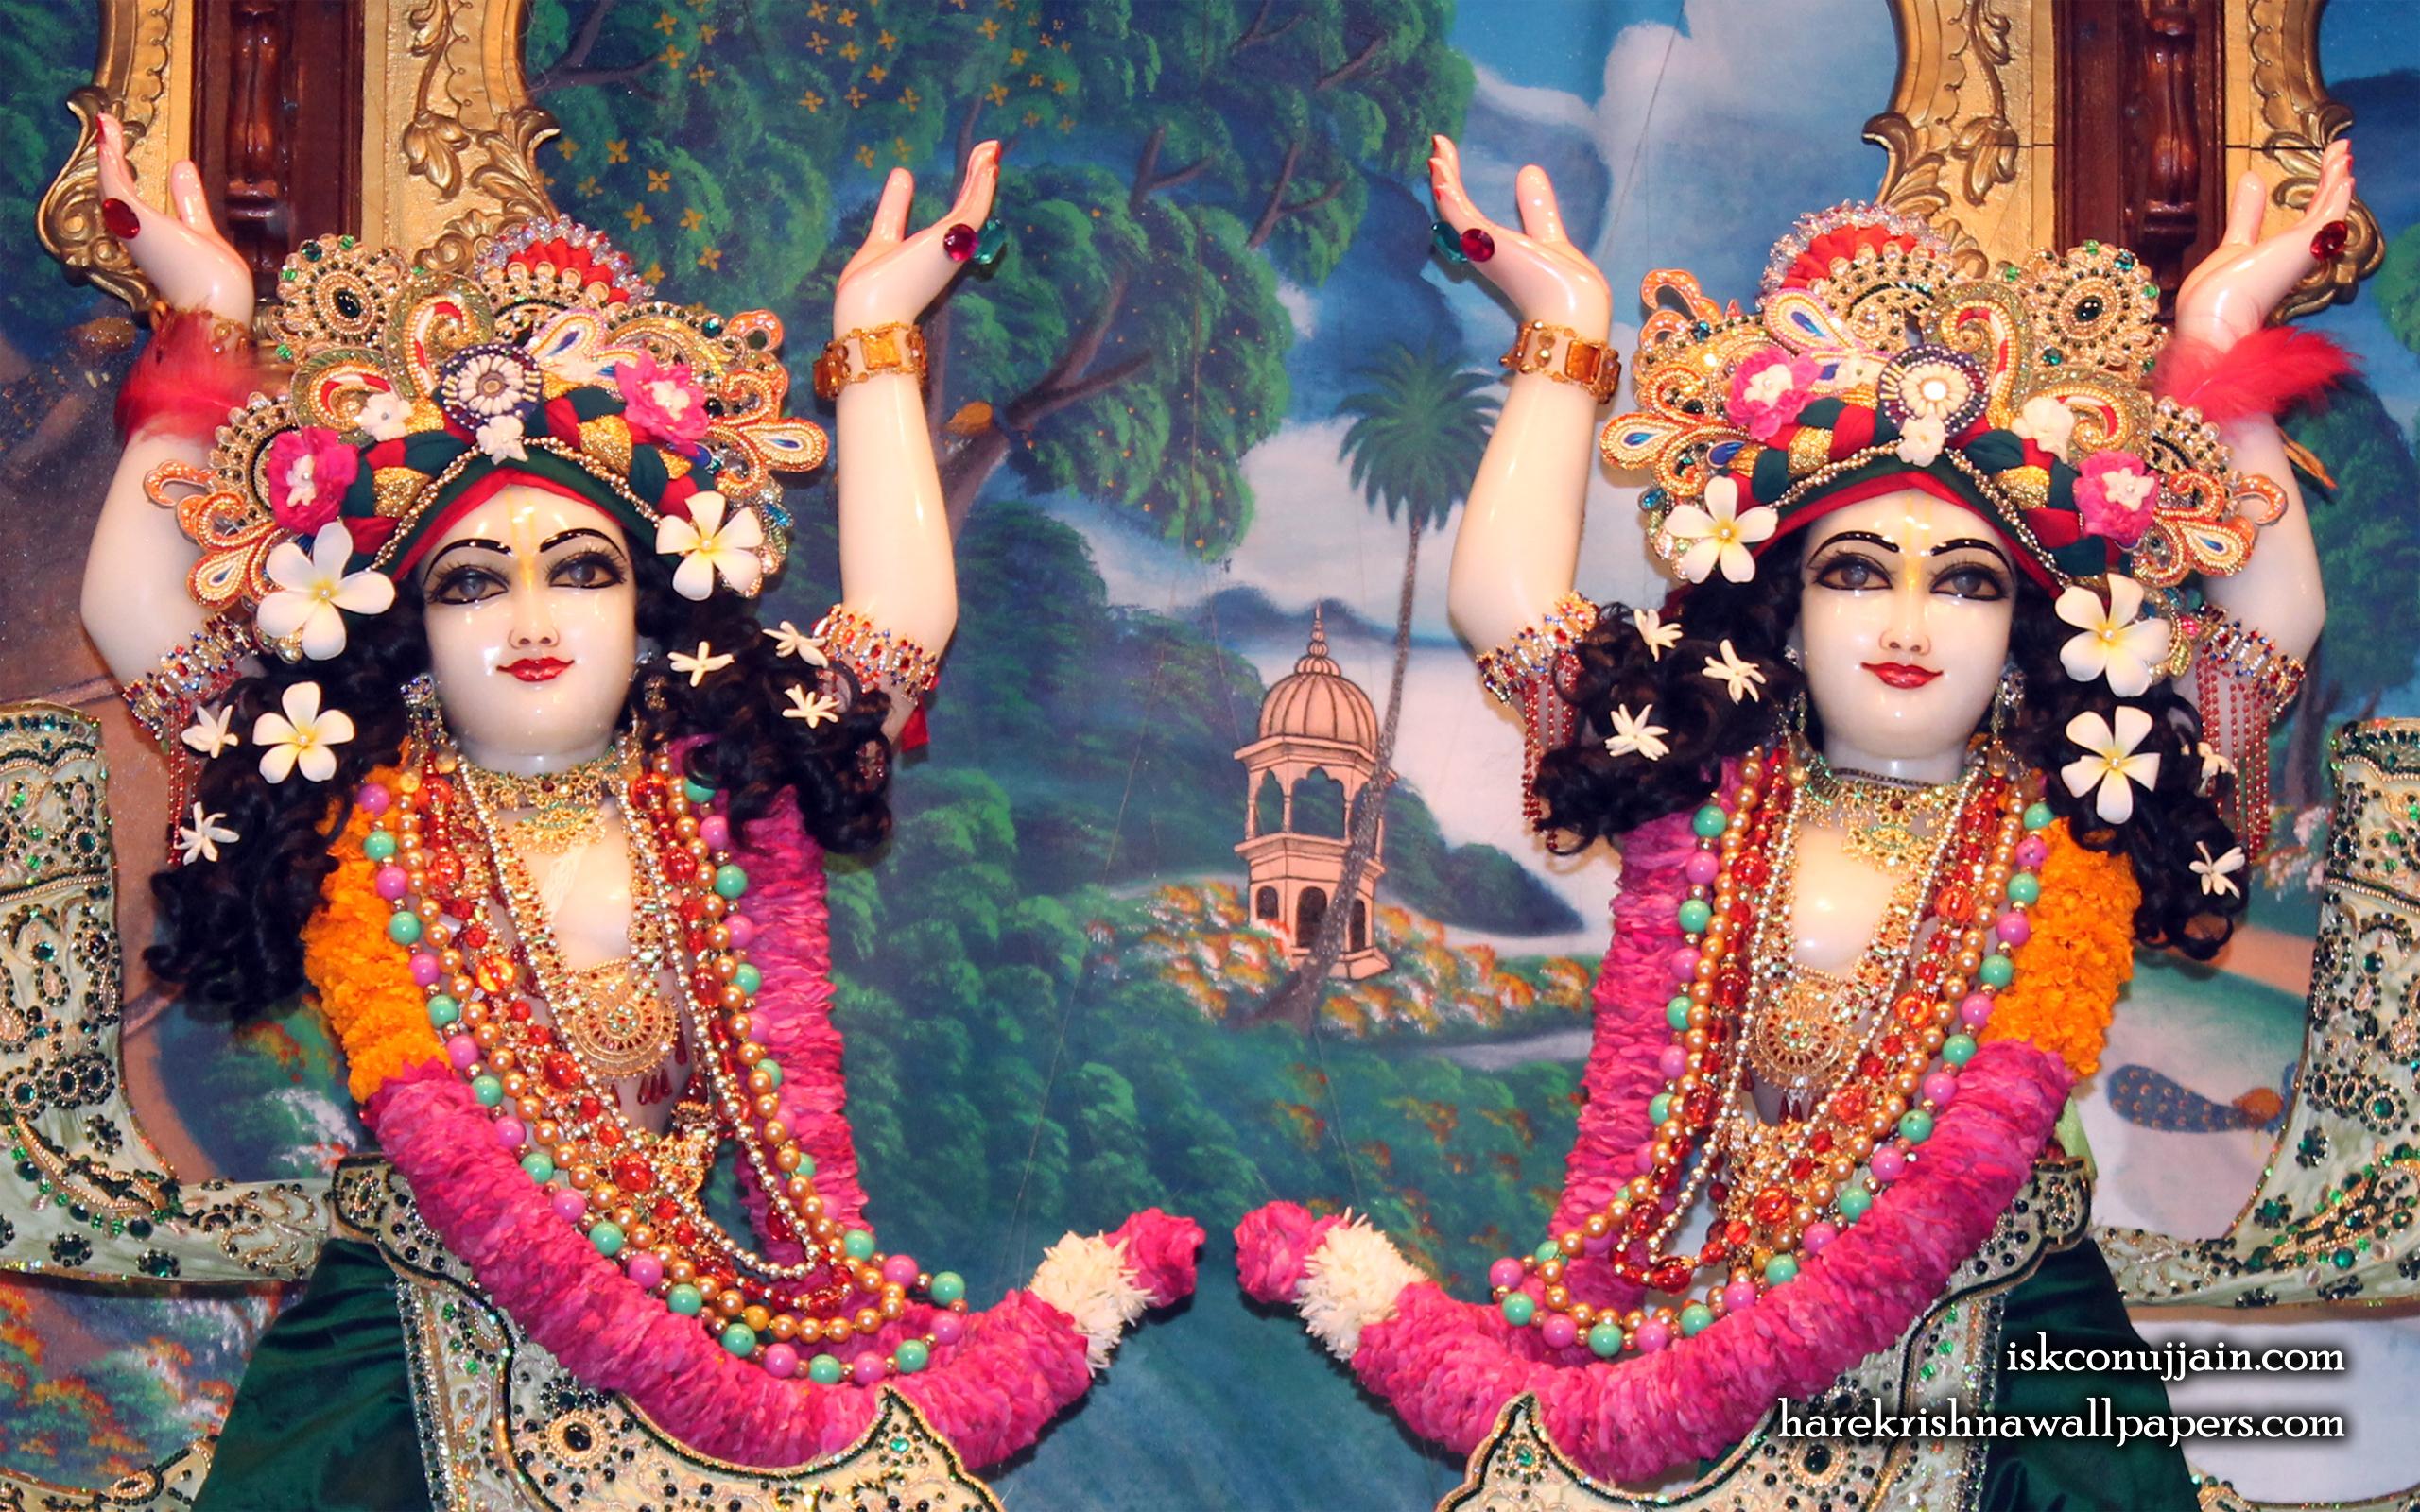 Sri Sri Gaura Nitai Close up Wallpaper (005) Size 2560x1600 Download